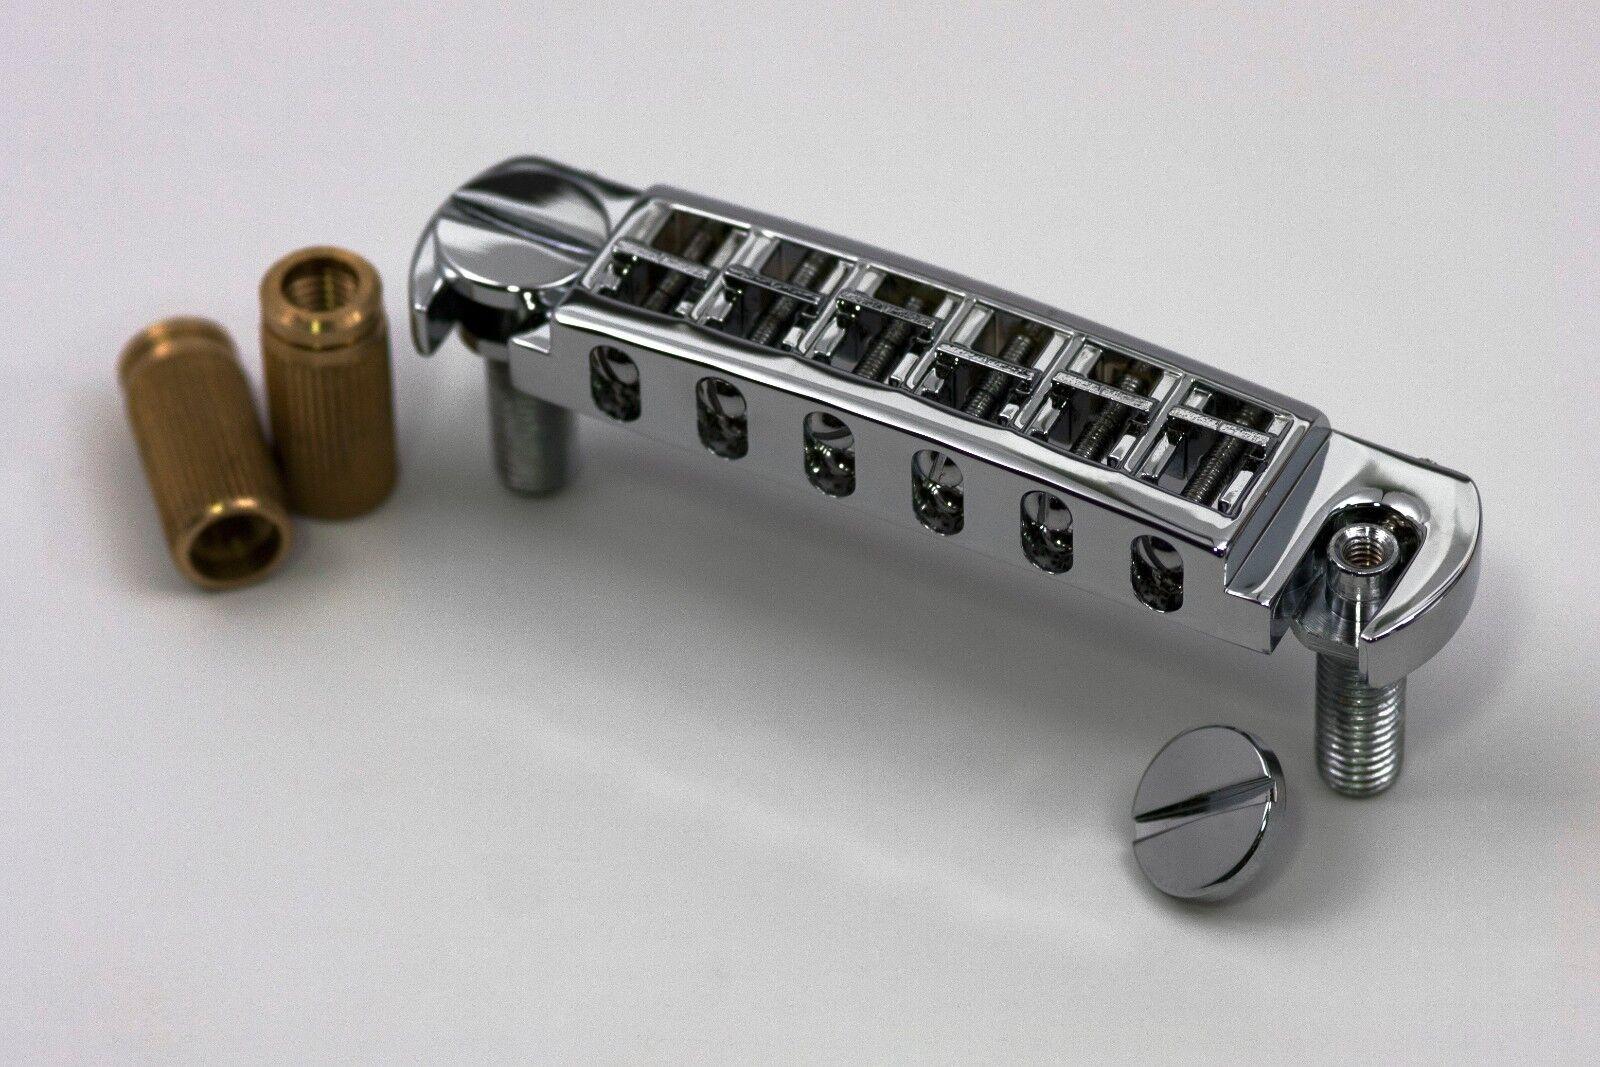 AVT2P-N TonePros (US Thread) Envolvente Standard puente acabado de níquel níquel níquel  punto de venta